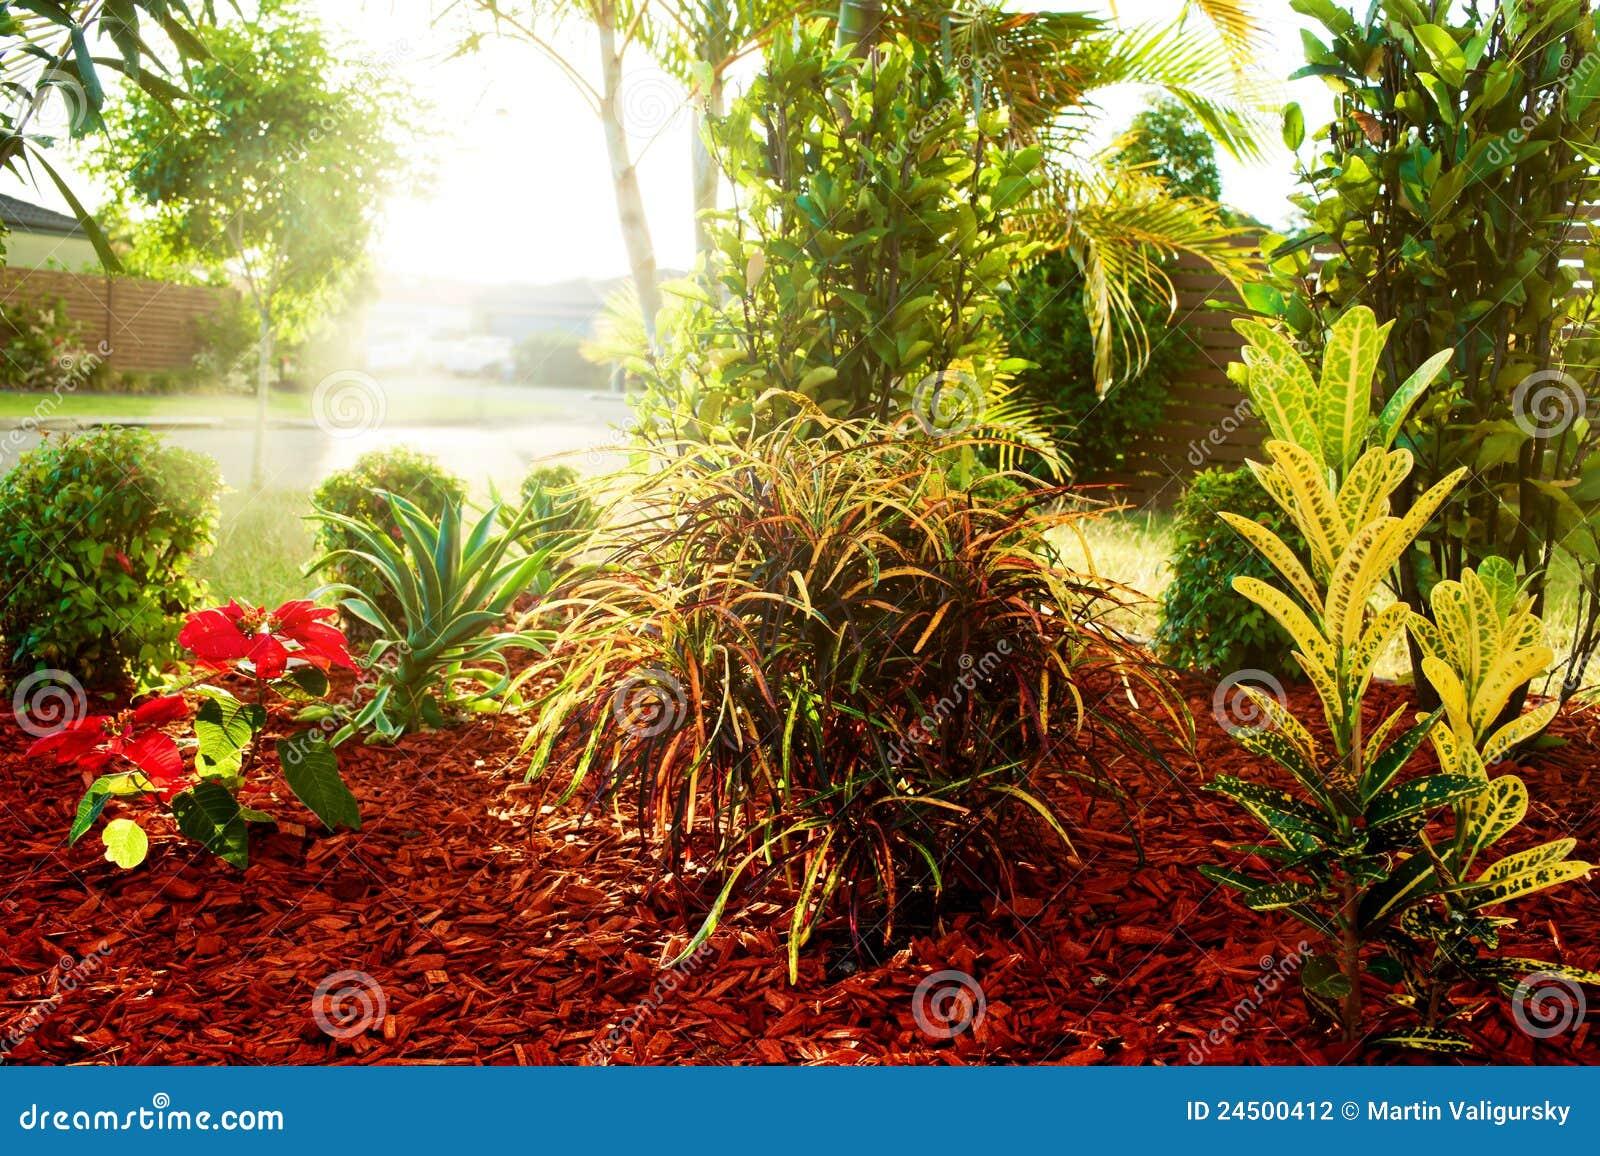 flores tropicais jardim : flores tropicais jardim:Colorful Tropical Garden Plants